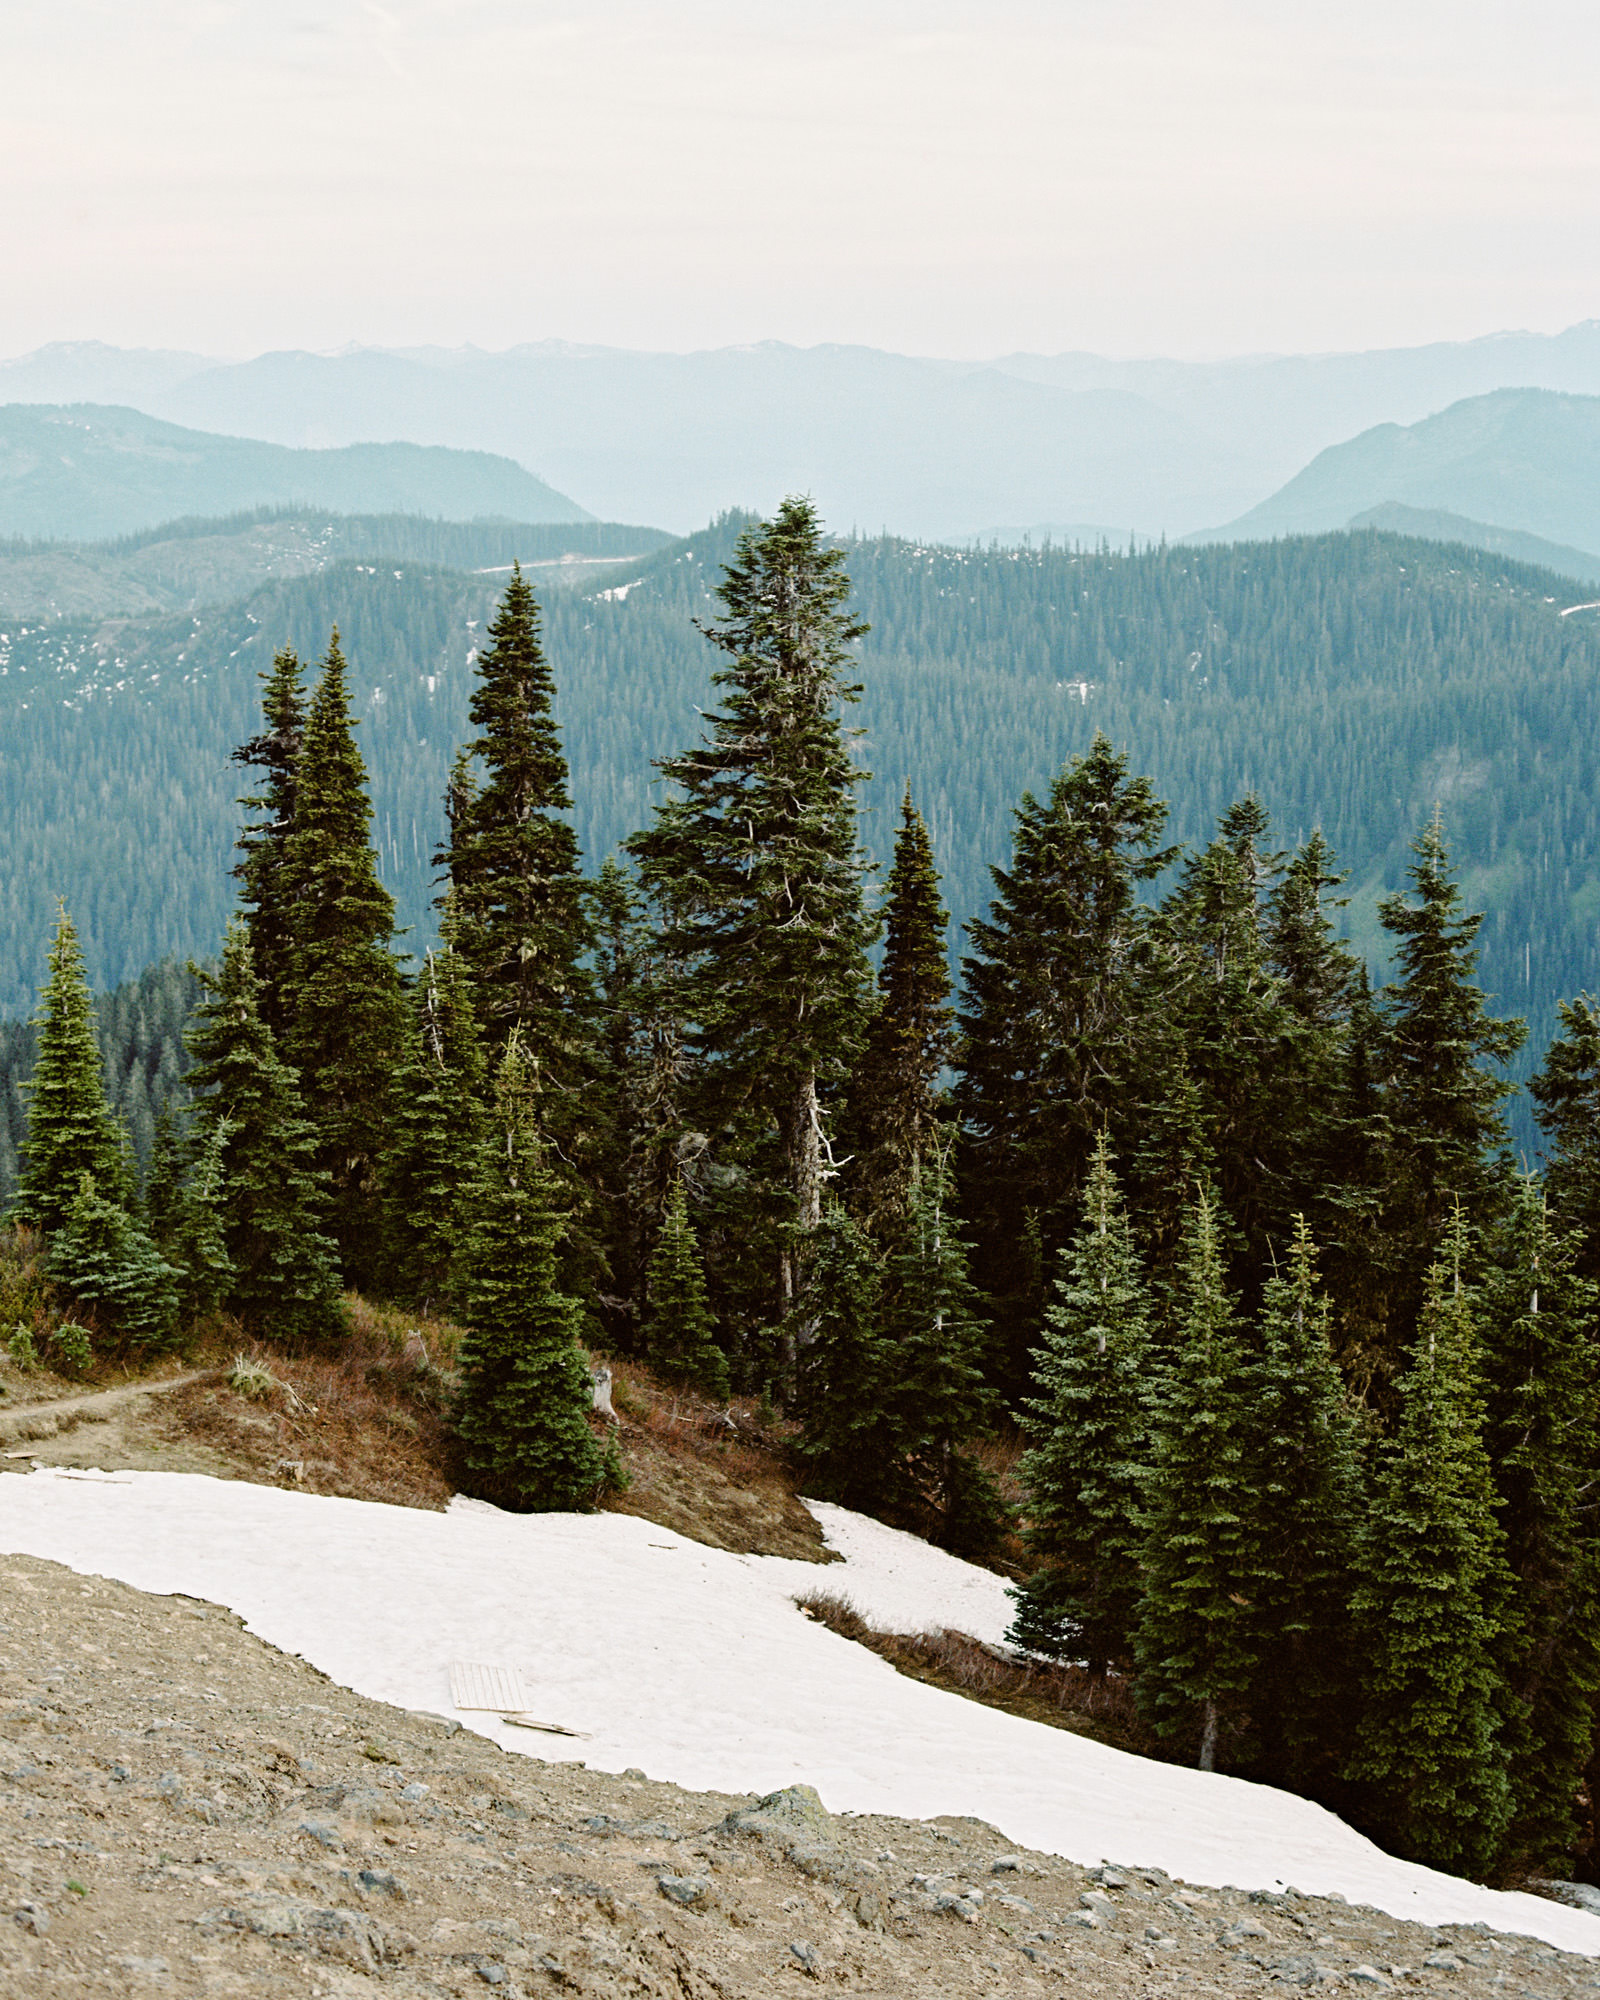 katelynnethan-blog-21 MOUNT RAINIER LOOKOUT ELOPEMENT